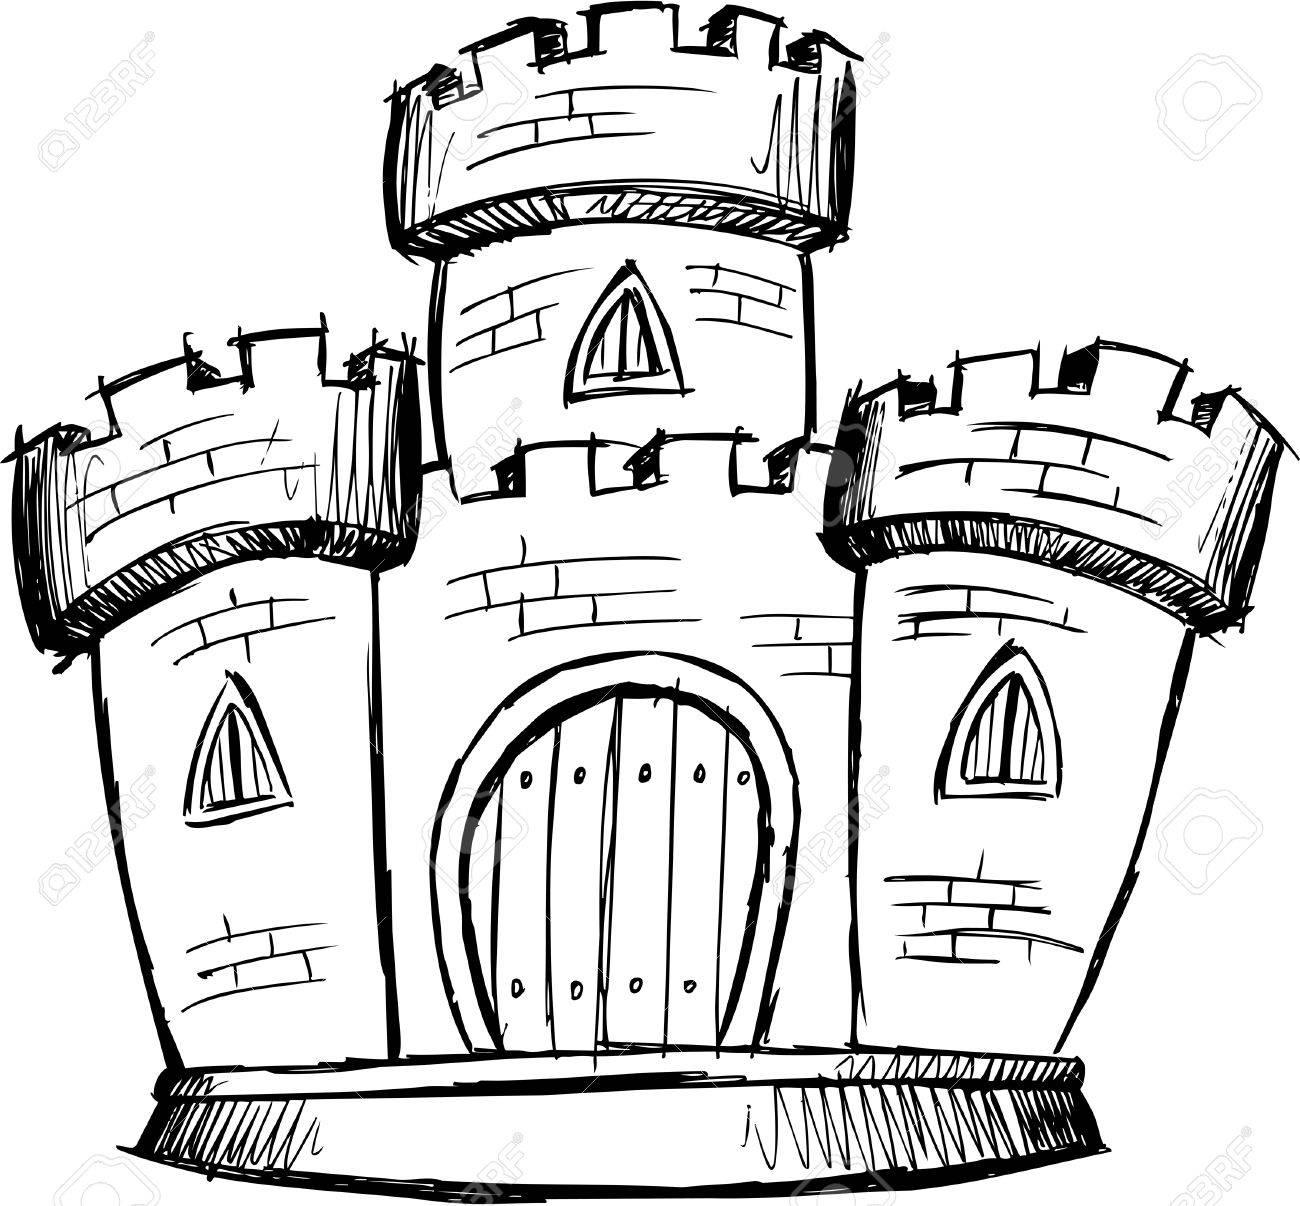 Doodle Sketchy Castle Stock Vector - 6774909